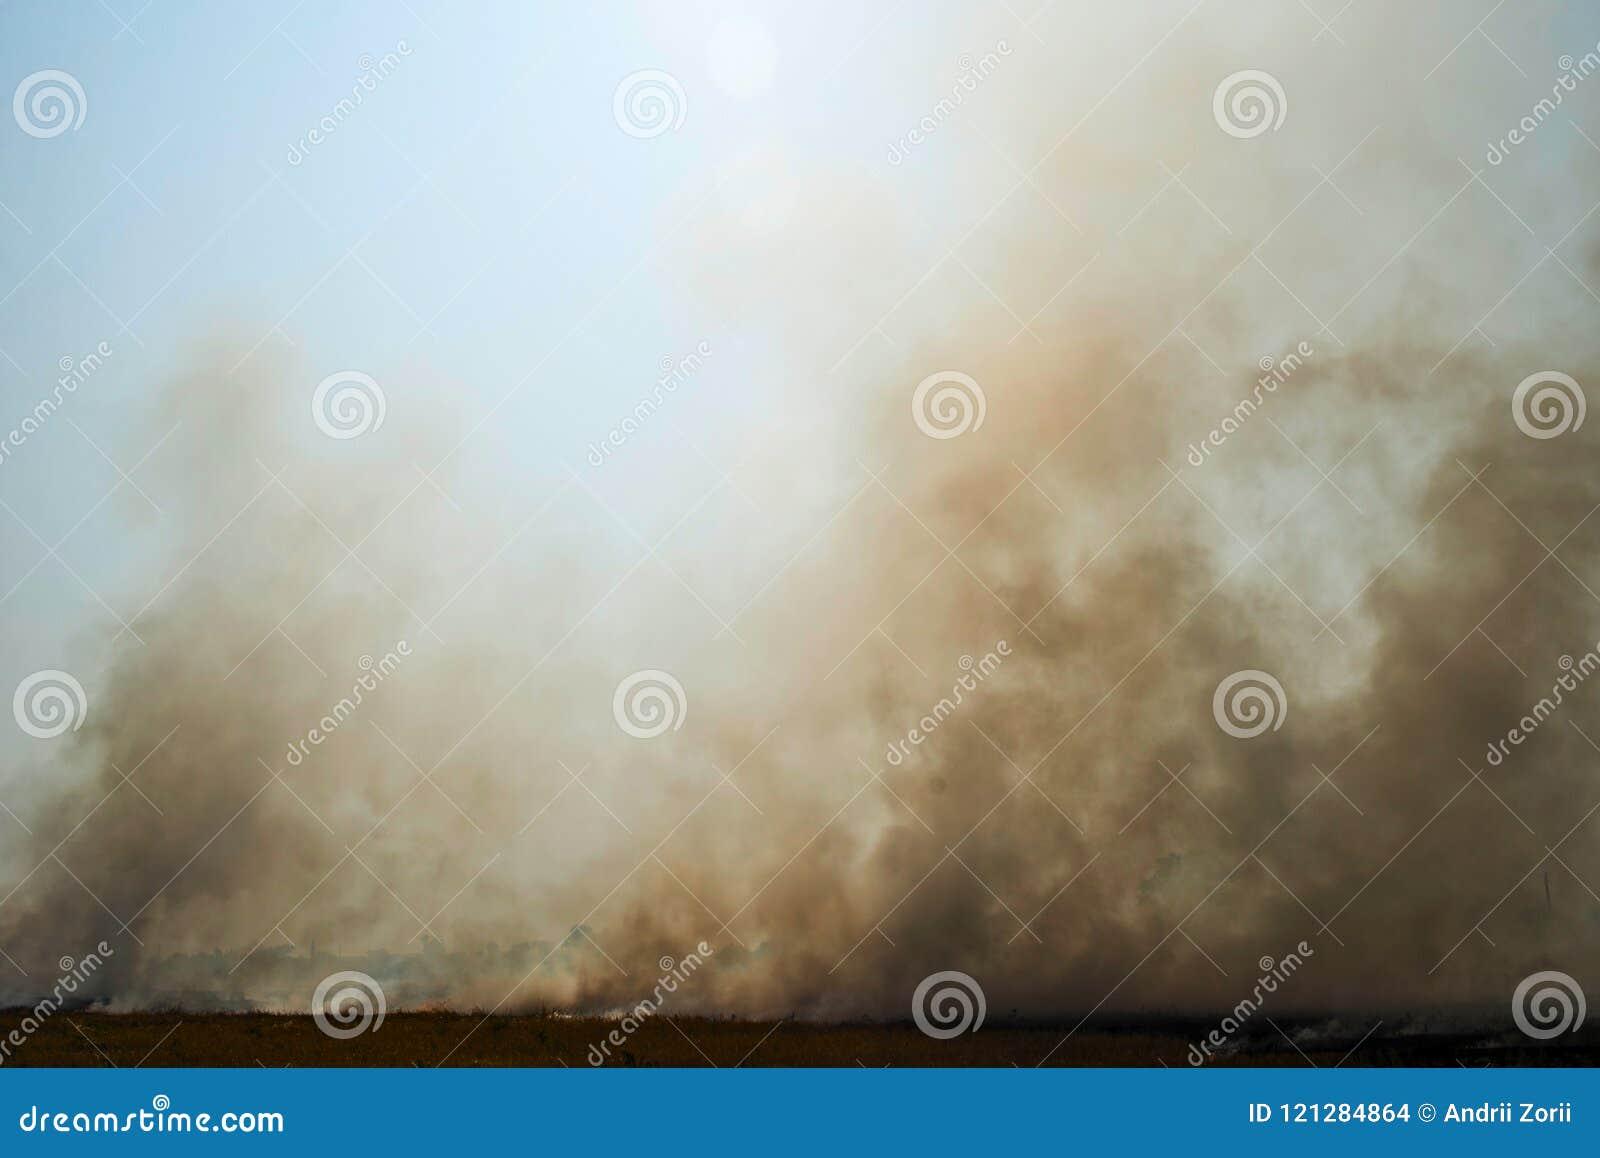 Dense smoke rising from a fire